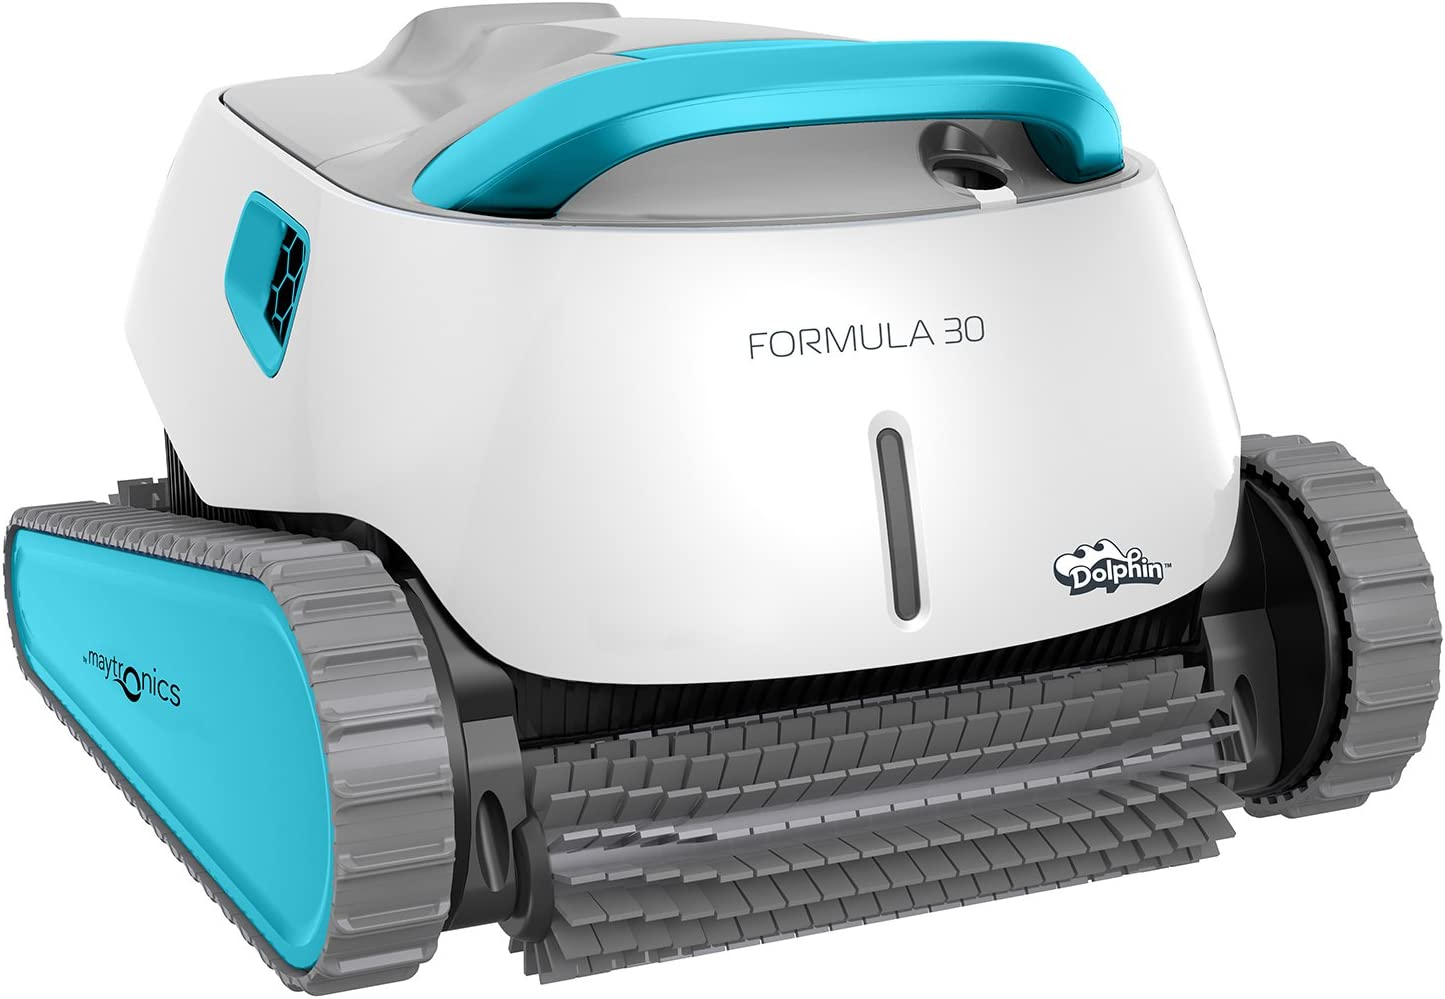 Poolaria Dolphin Formula 30 - Robot limpiafondos para Piscinas (Fondo, Paredes y línea de flotación)